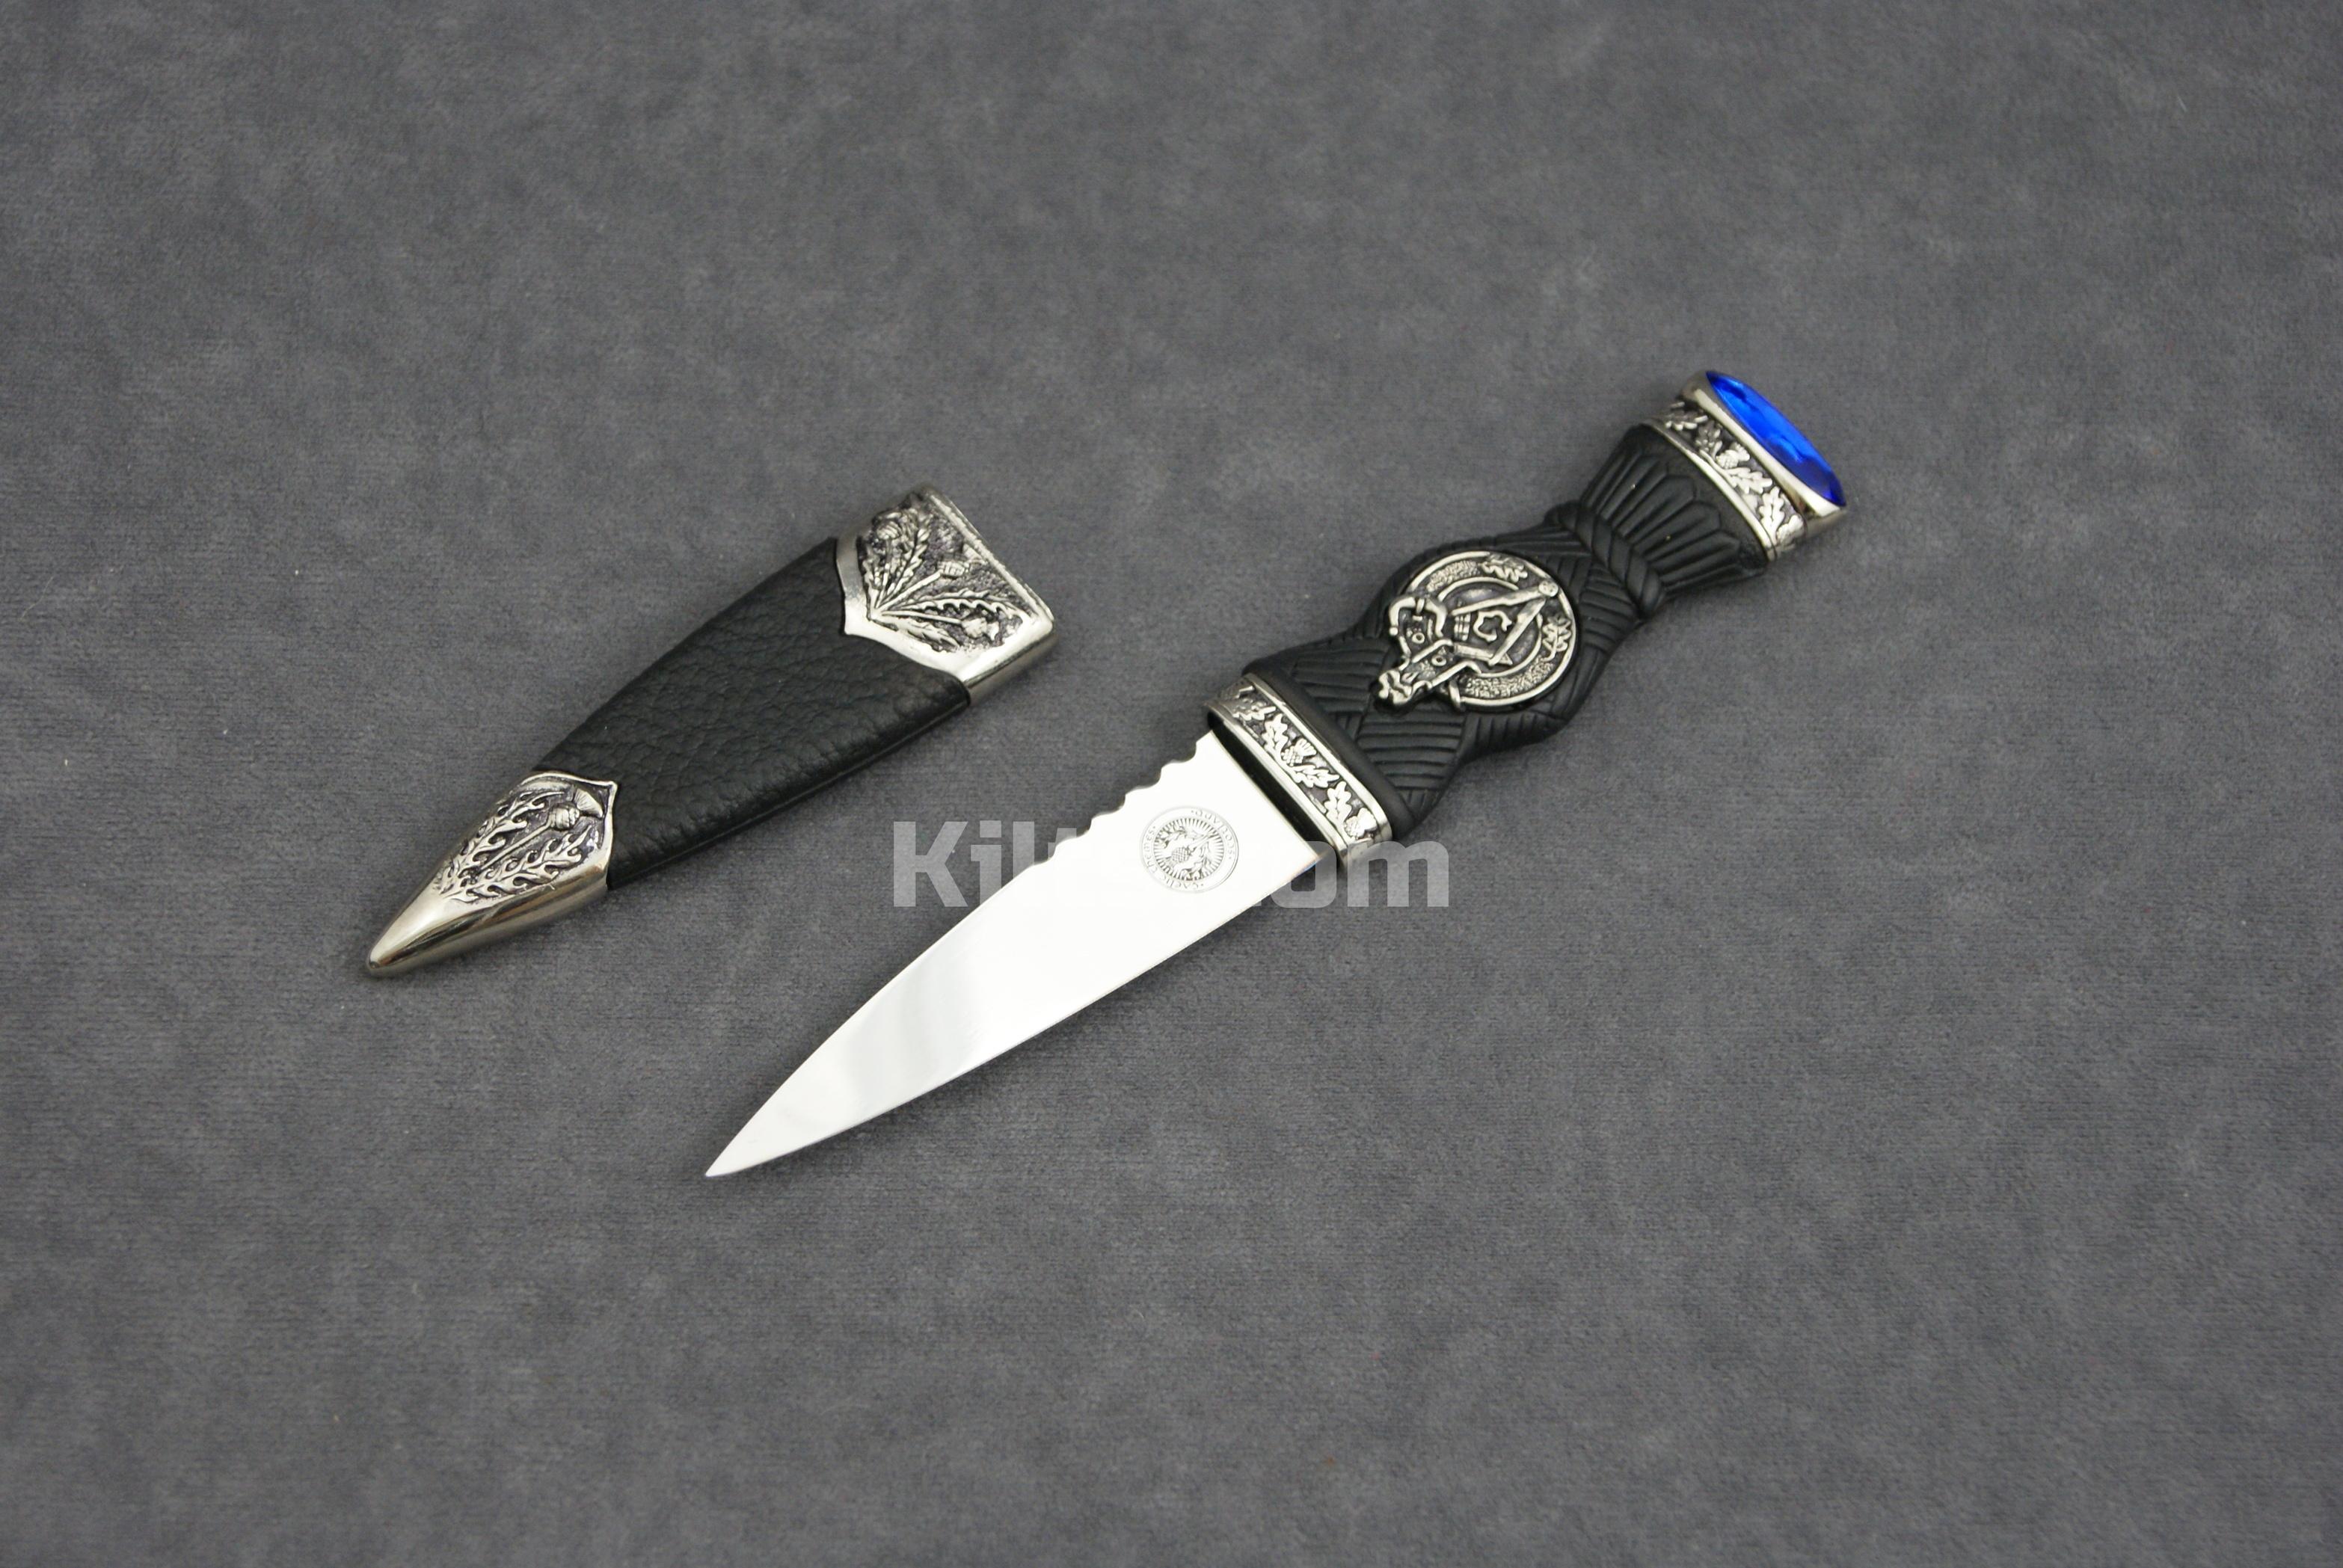 Looking for a Masonic Sgian Dubh or a Masonic Kilt Knife?